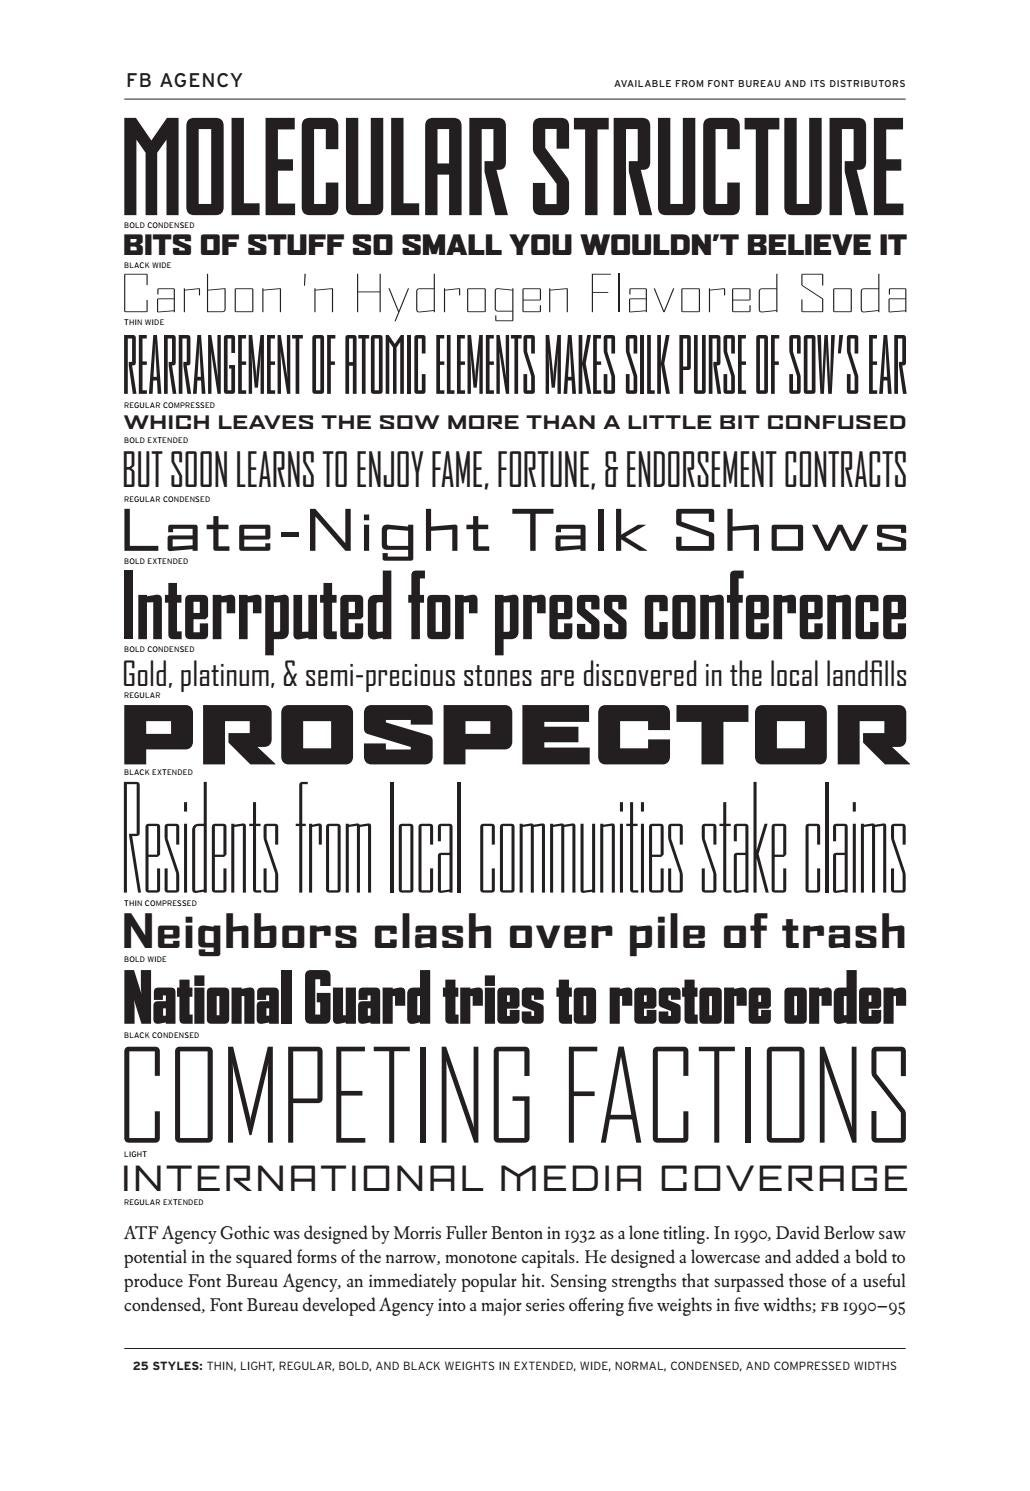 catalogo font bureau inc by Rafa Clariana - issuu